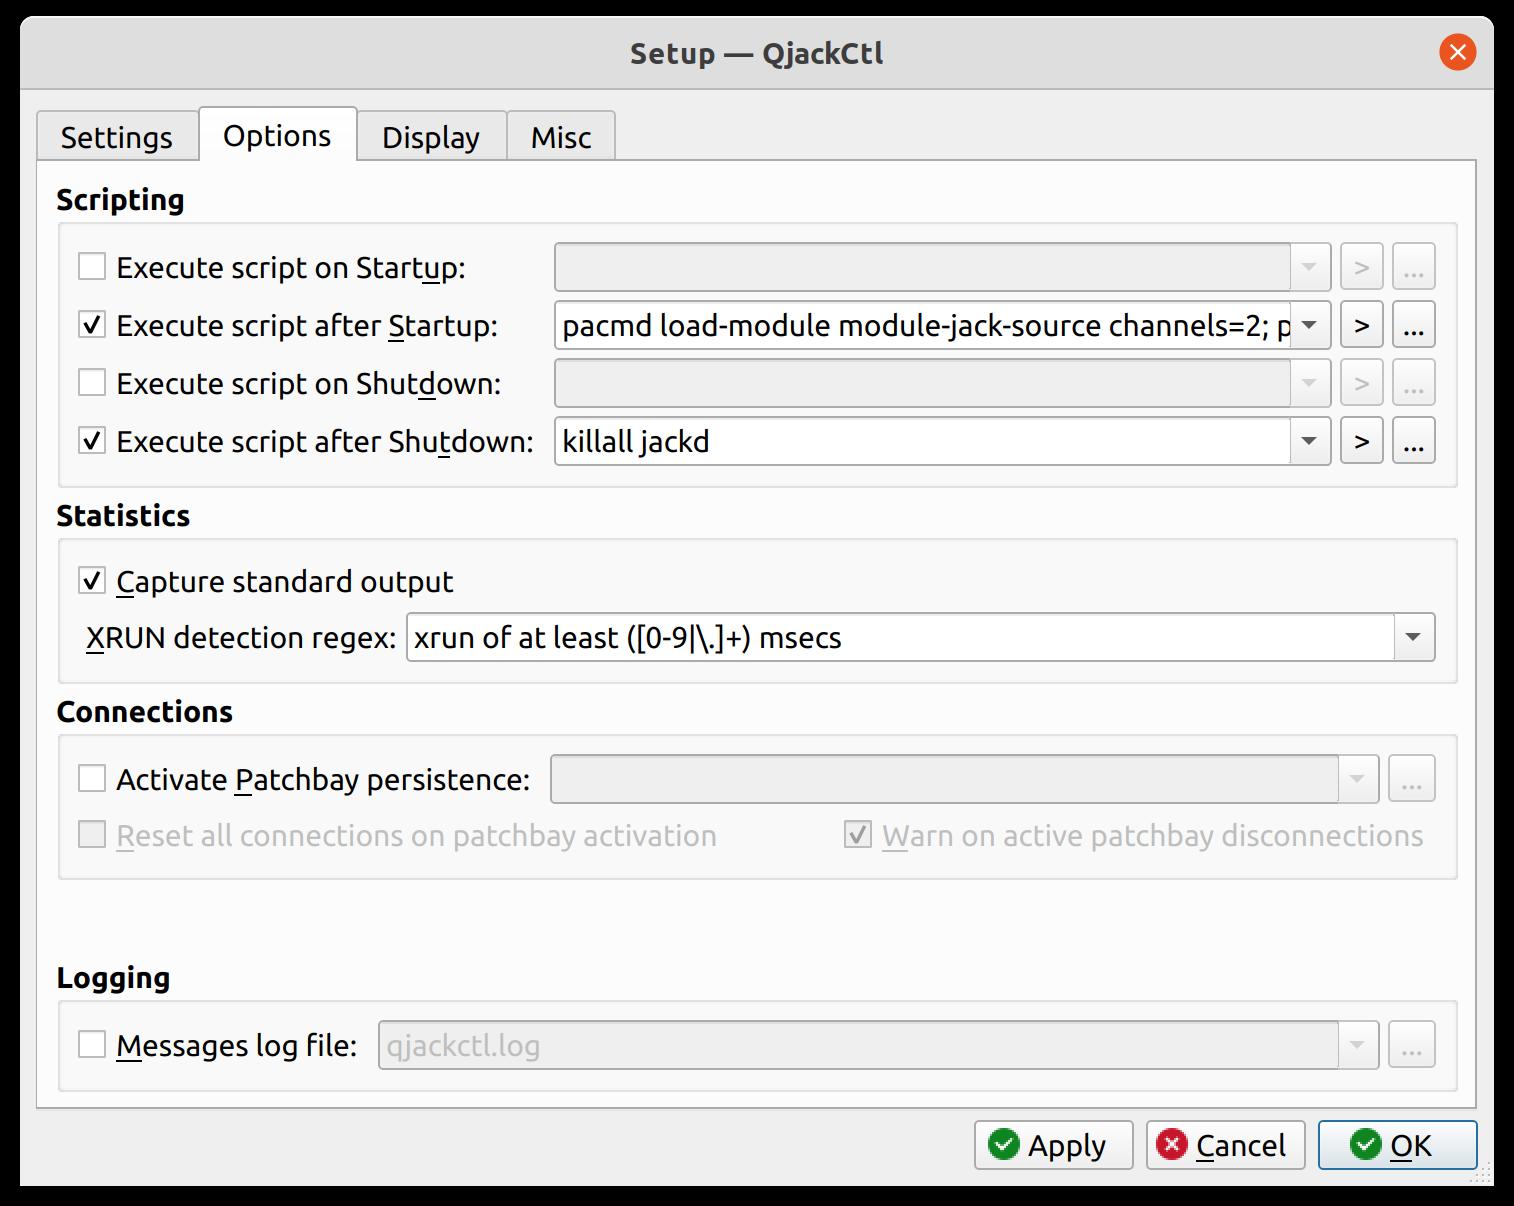 QjackCtl-Setup-Options